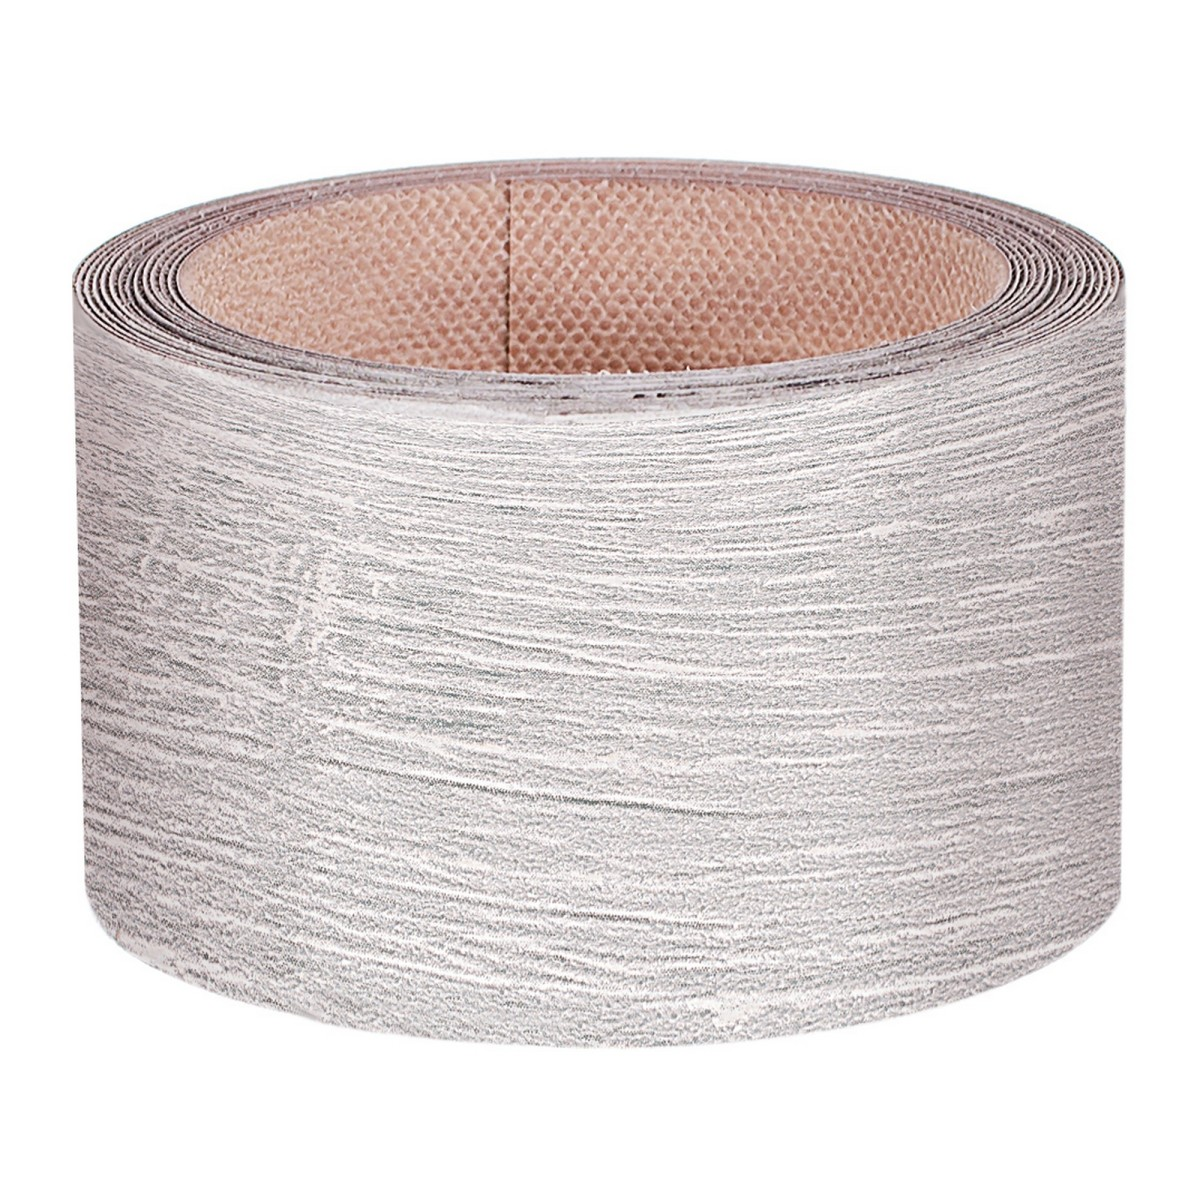 Кромка №3310 с клеем для столешницы 305х4.2 см цвет серый